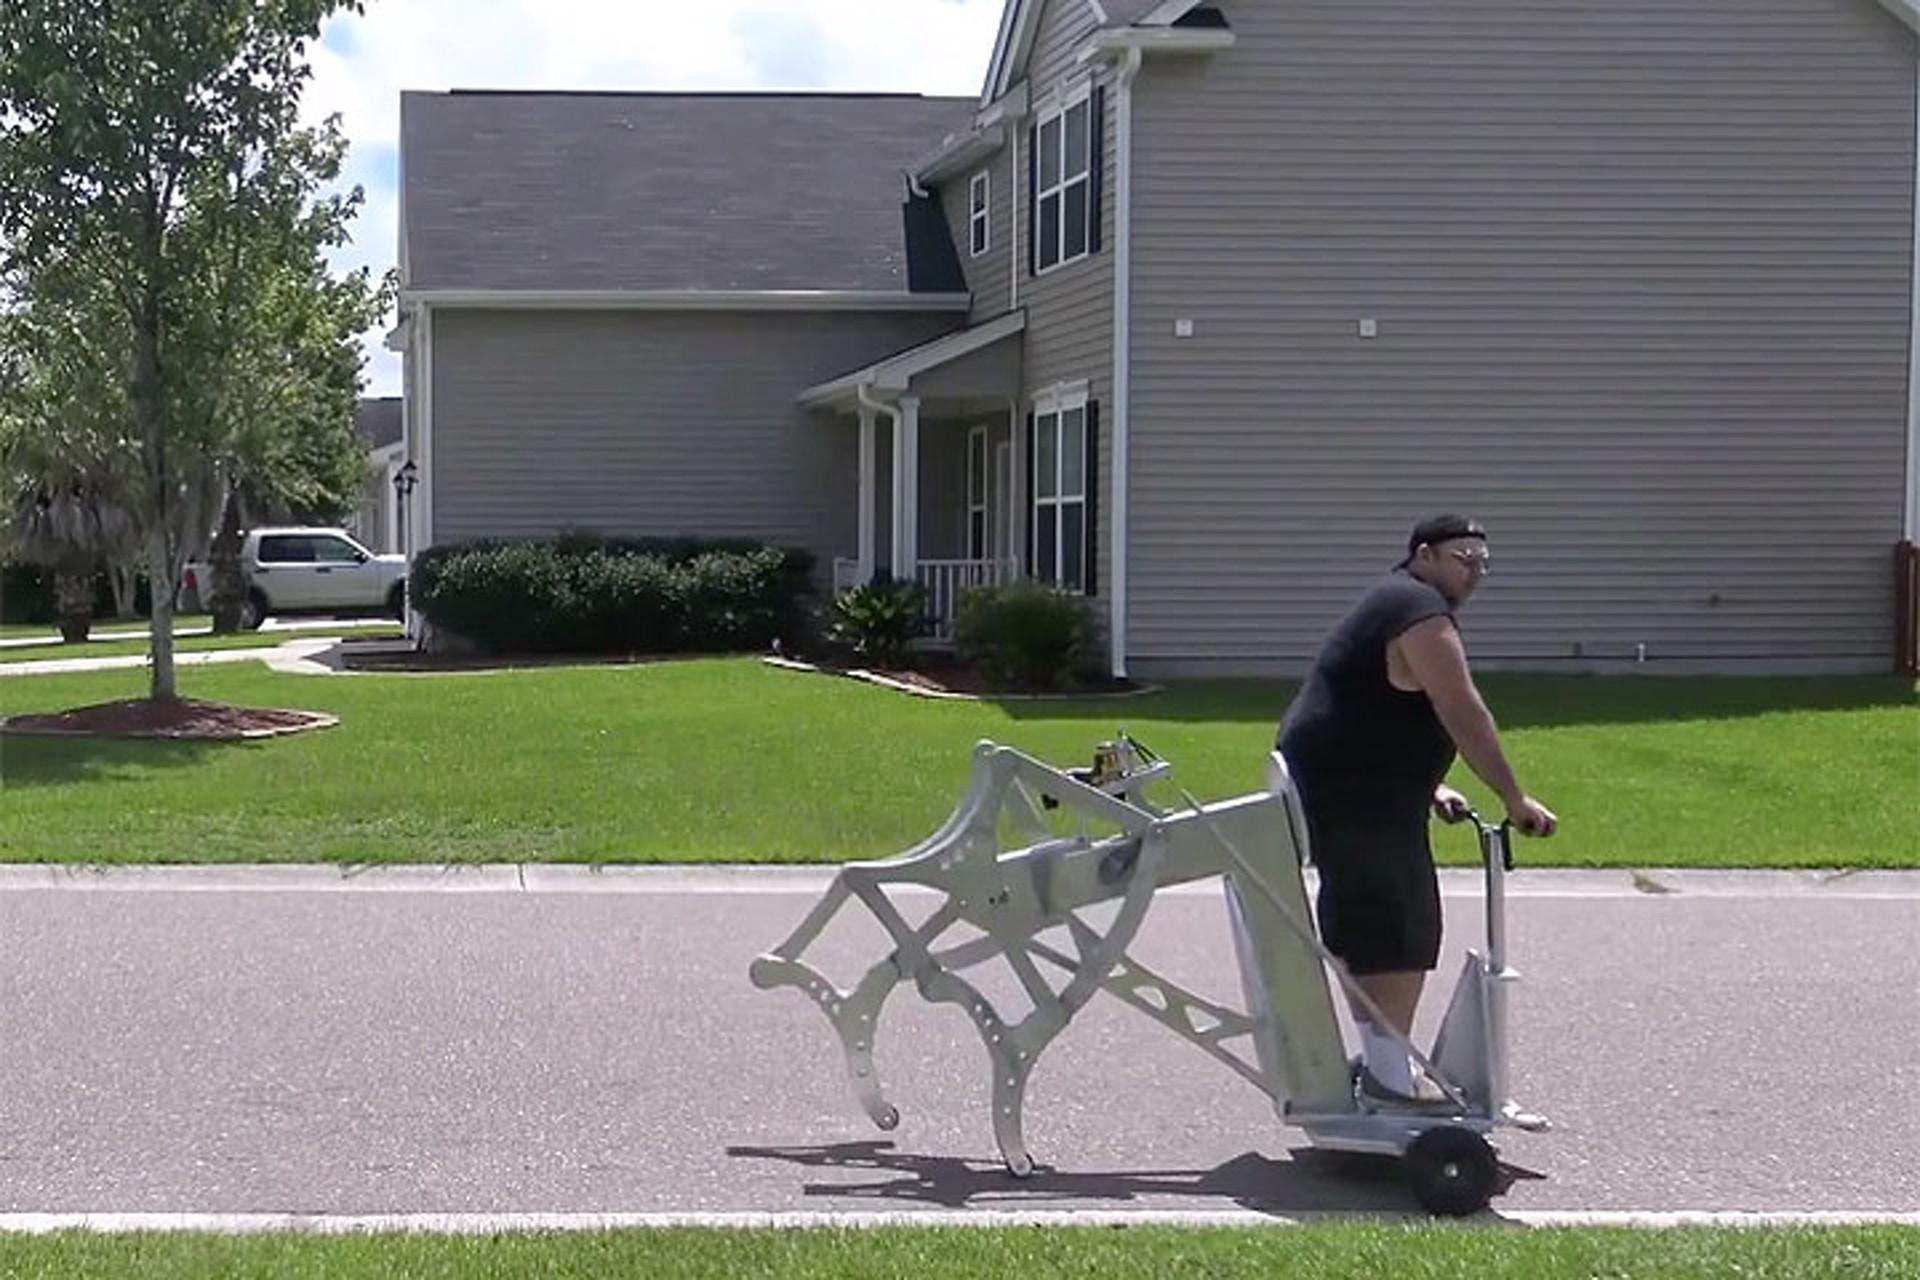 Watch This Drill-Powered Walking Machine Strut its Stuff